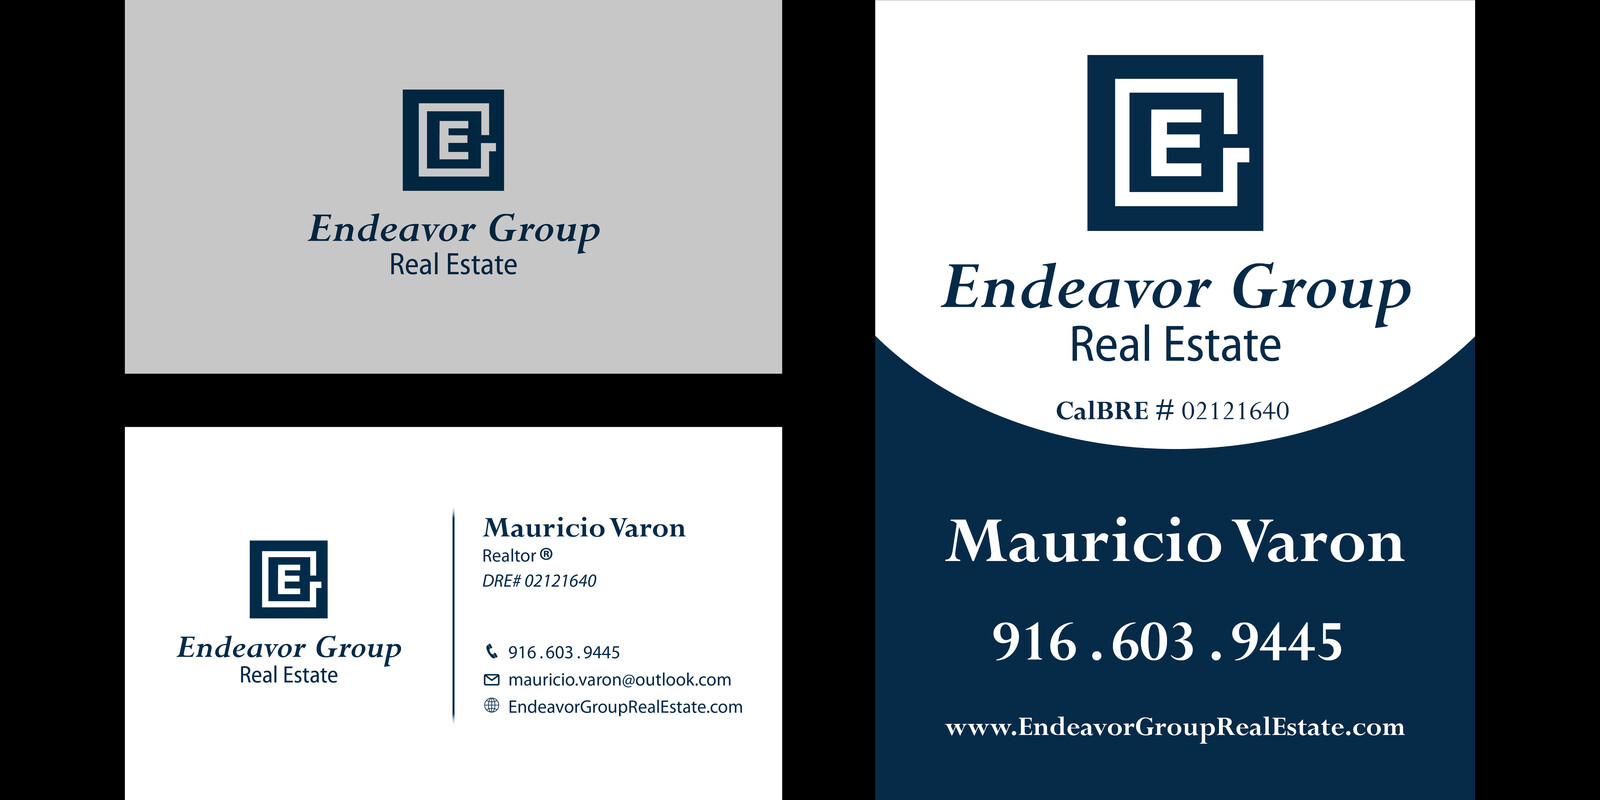 Logo and banner design for real estate agent